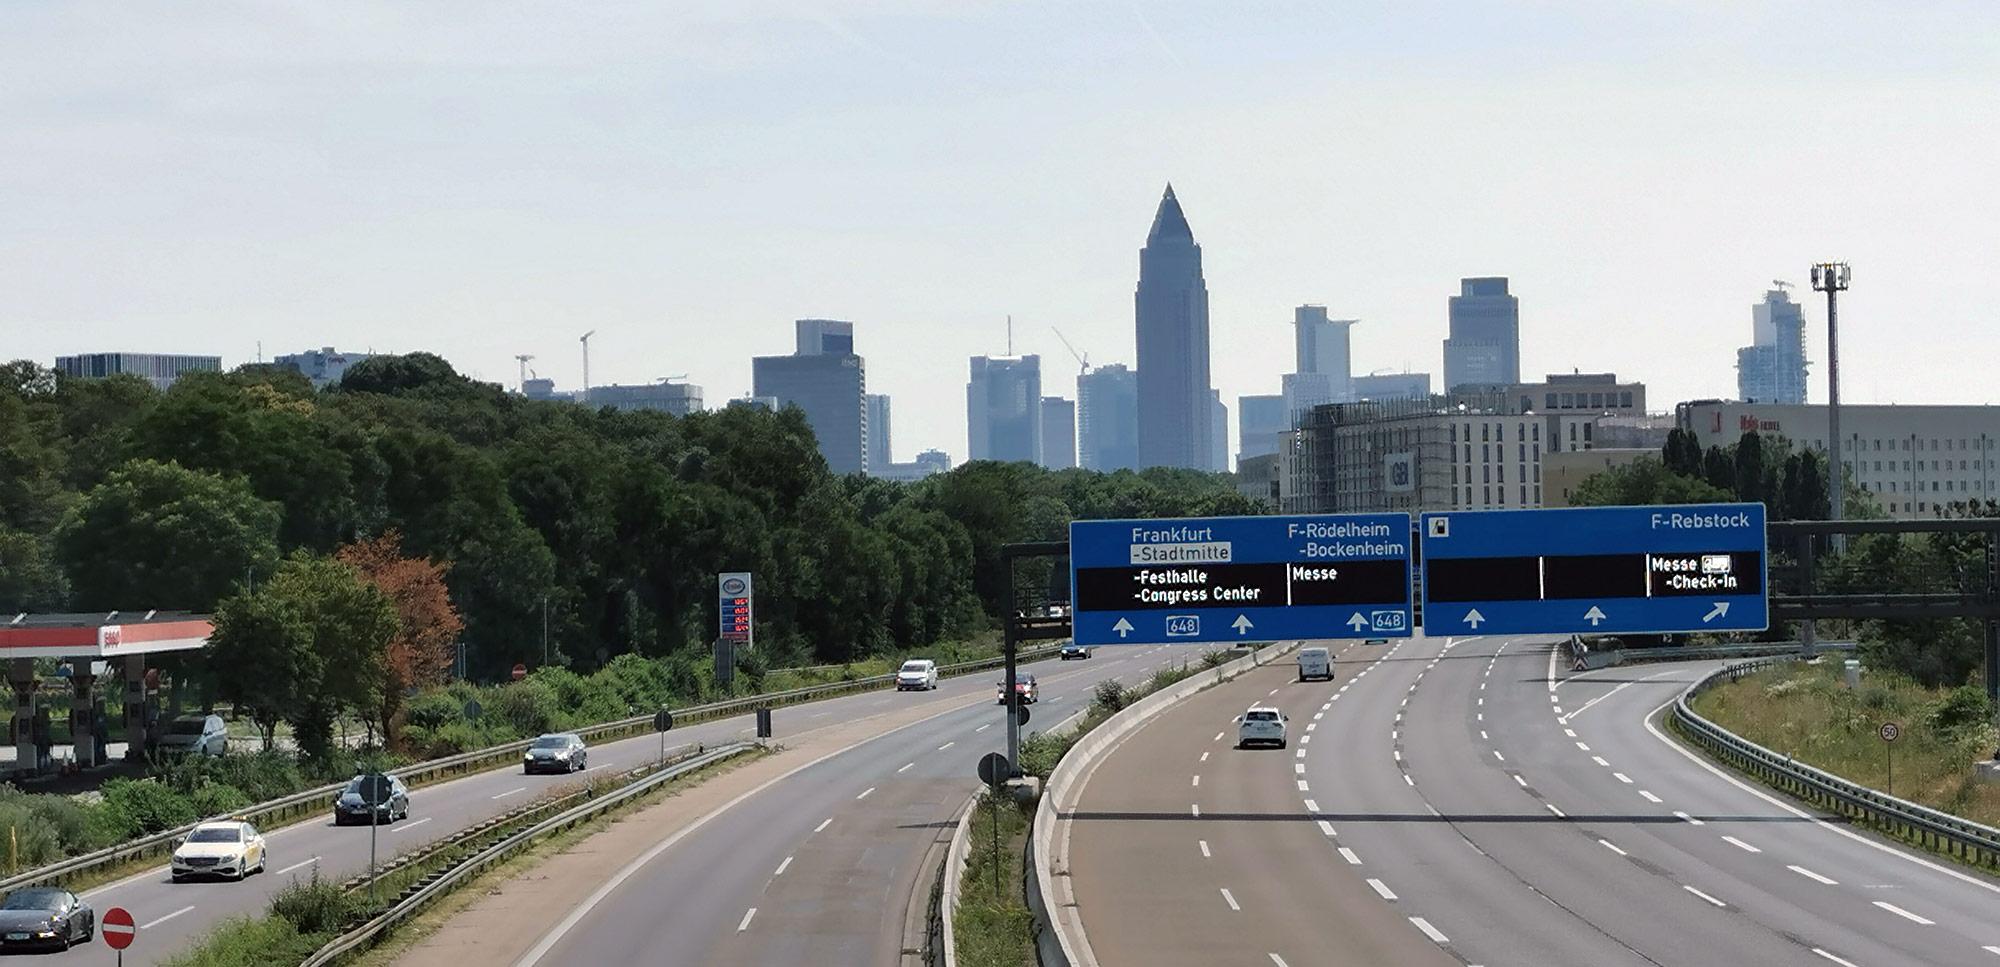 Wo sind die besten Fotolocations in Frankfurt?